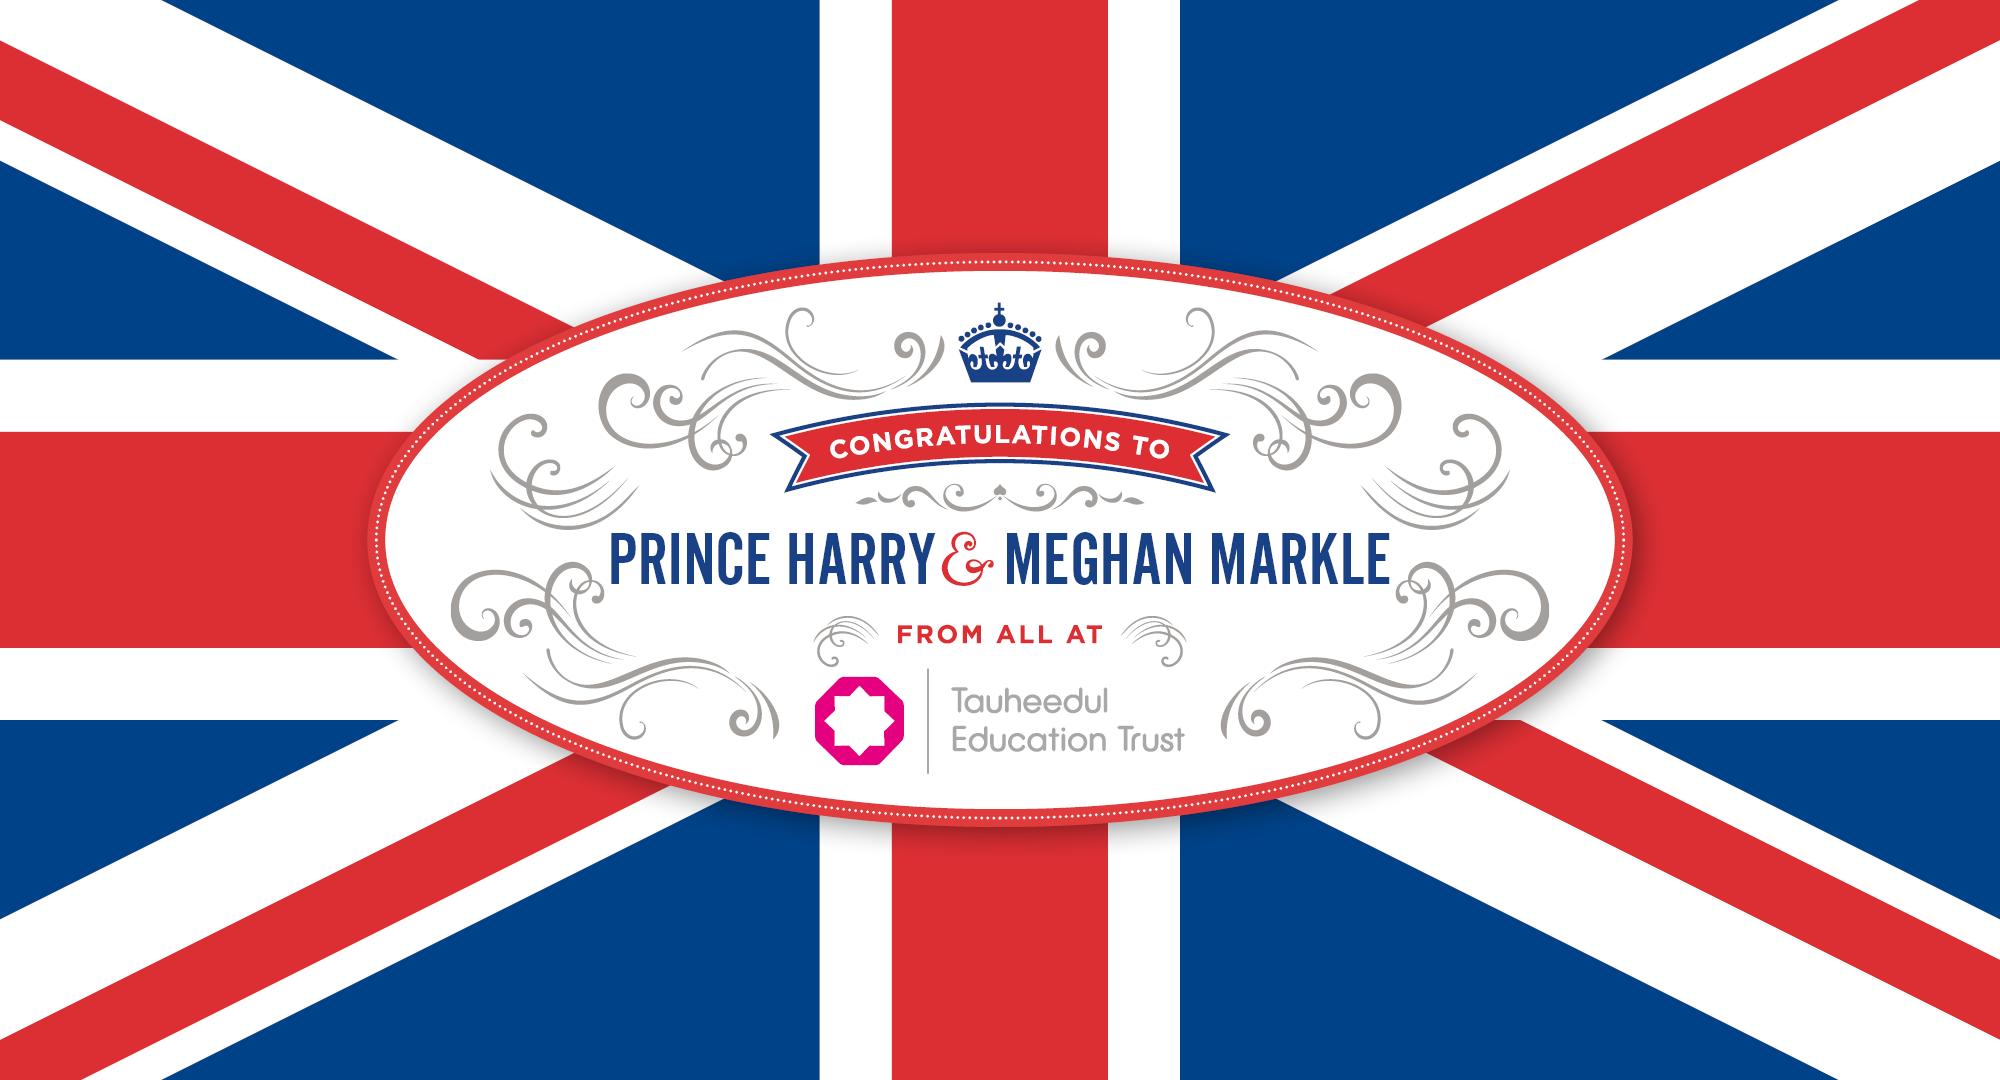 TET_Royal_Wedding_Web_Banner_2000x1080px